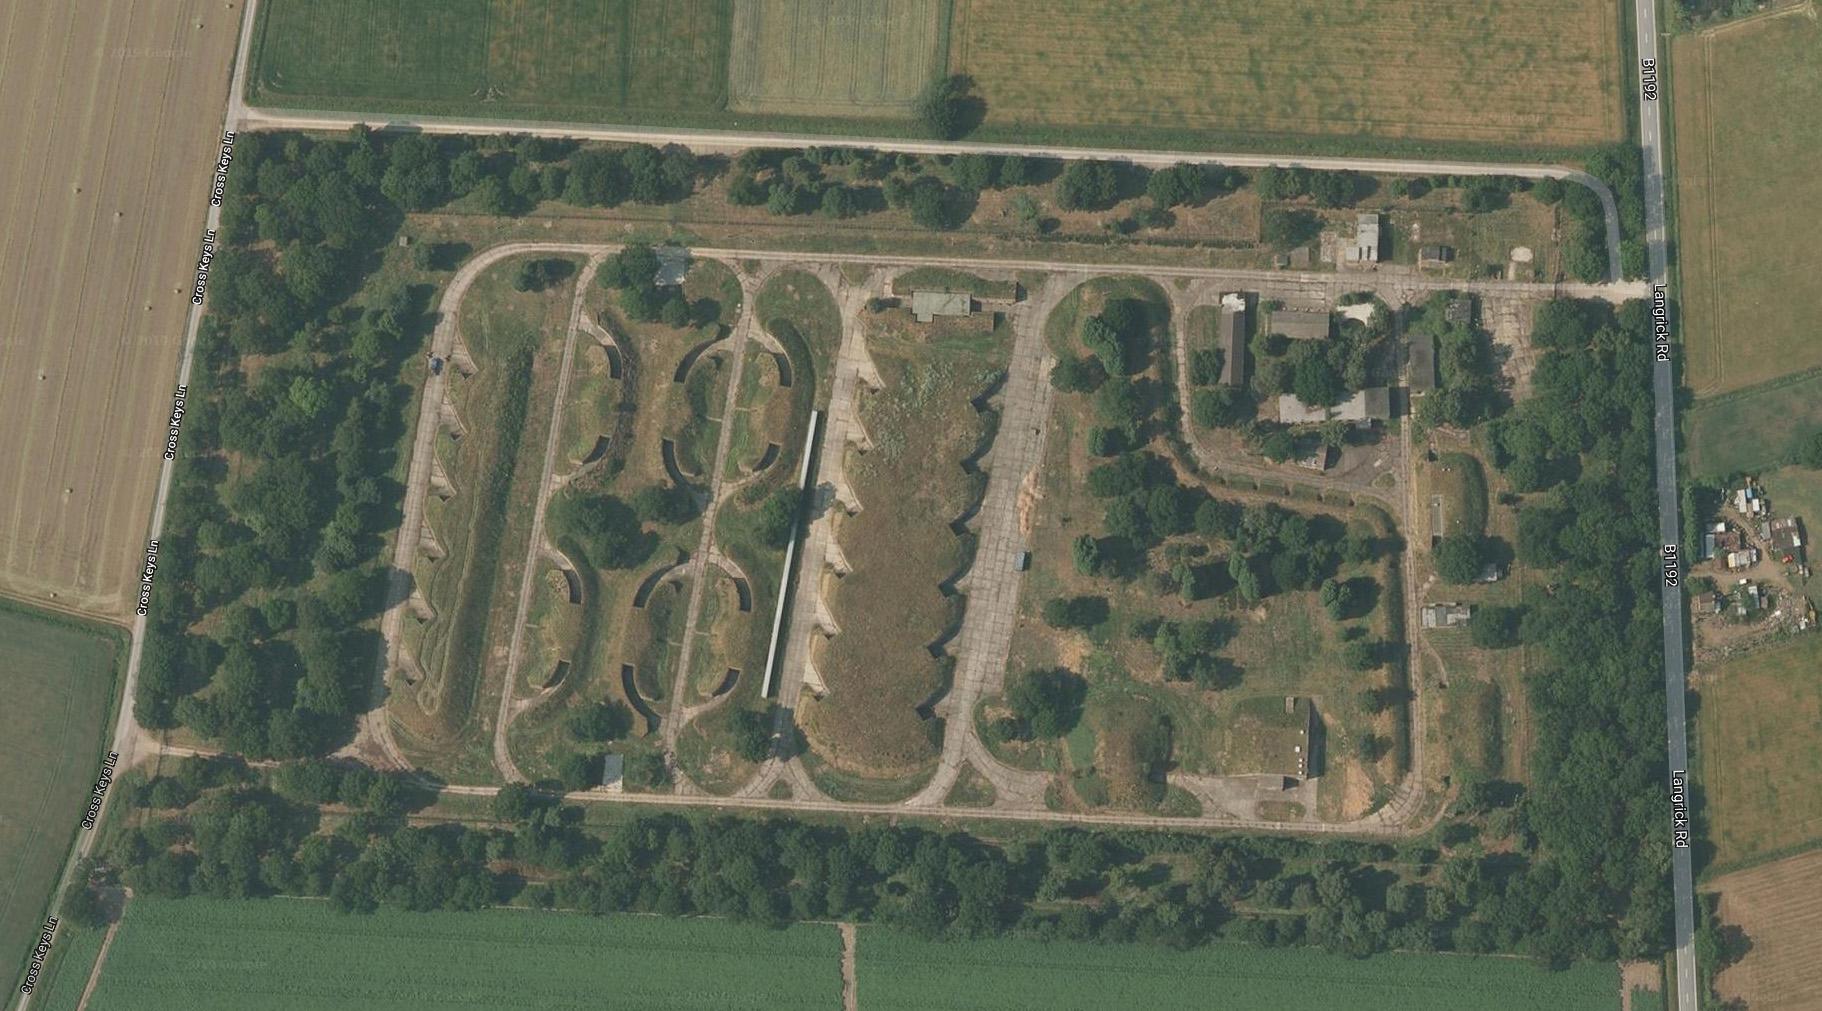 raf-coningsby-bomb-store-aerial.jpg